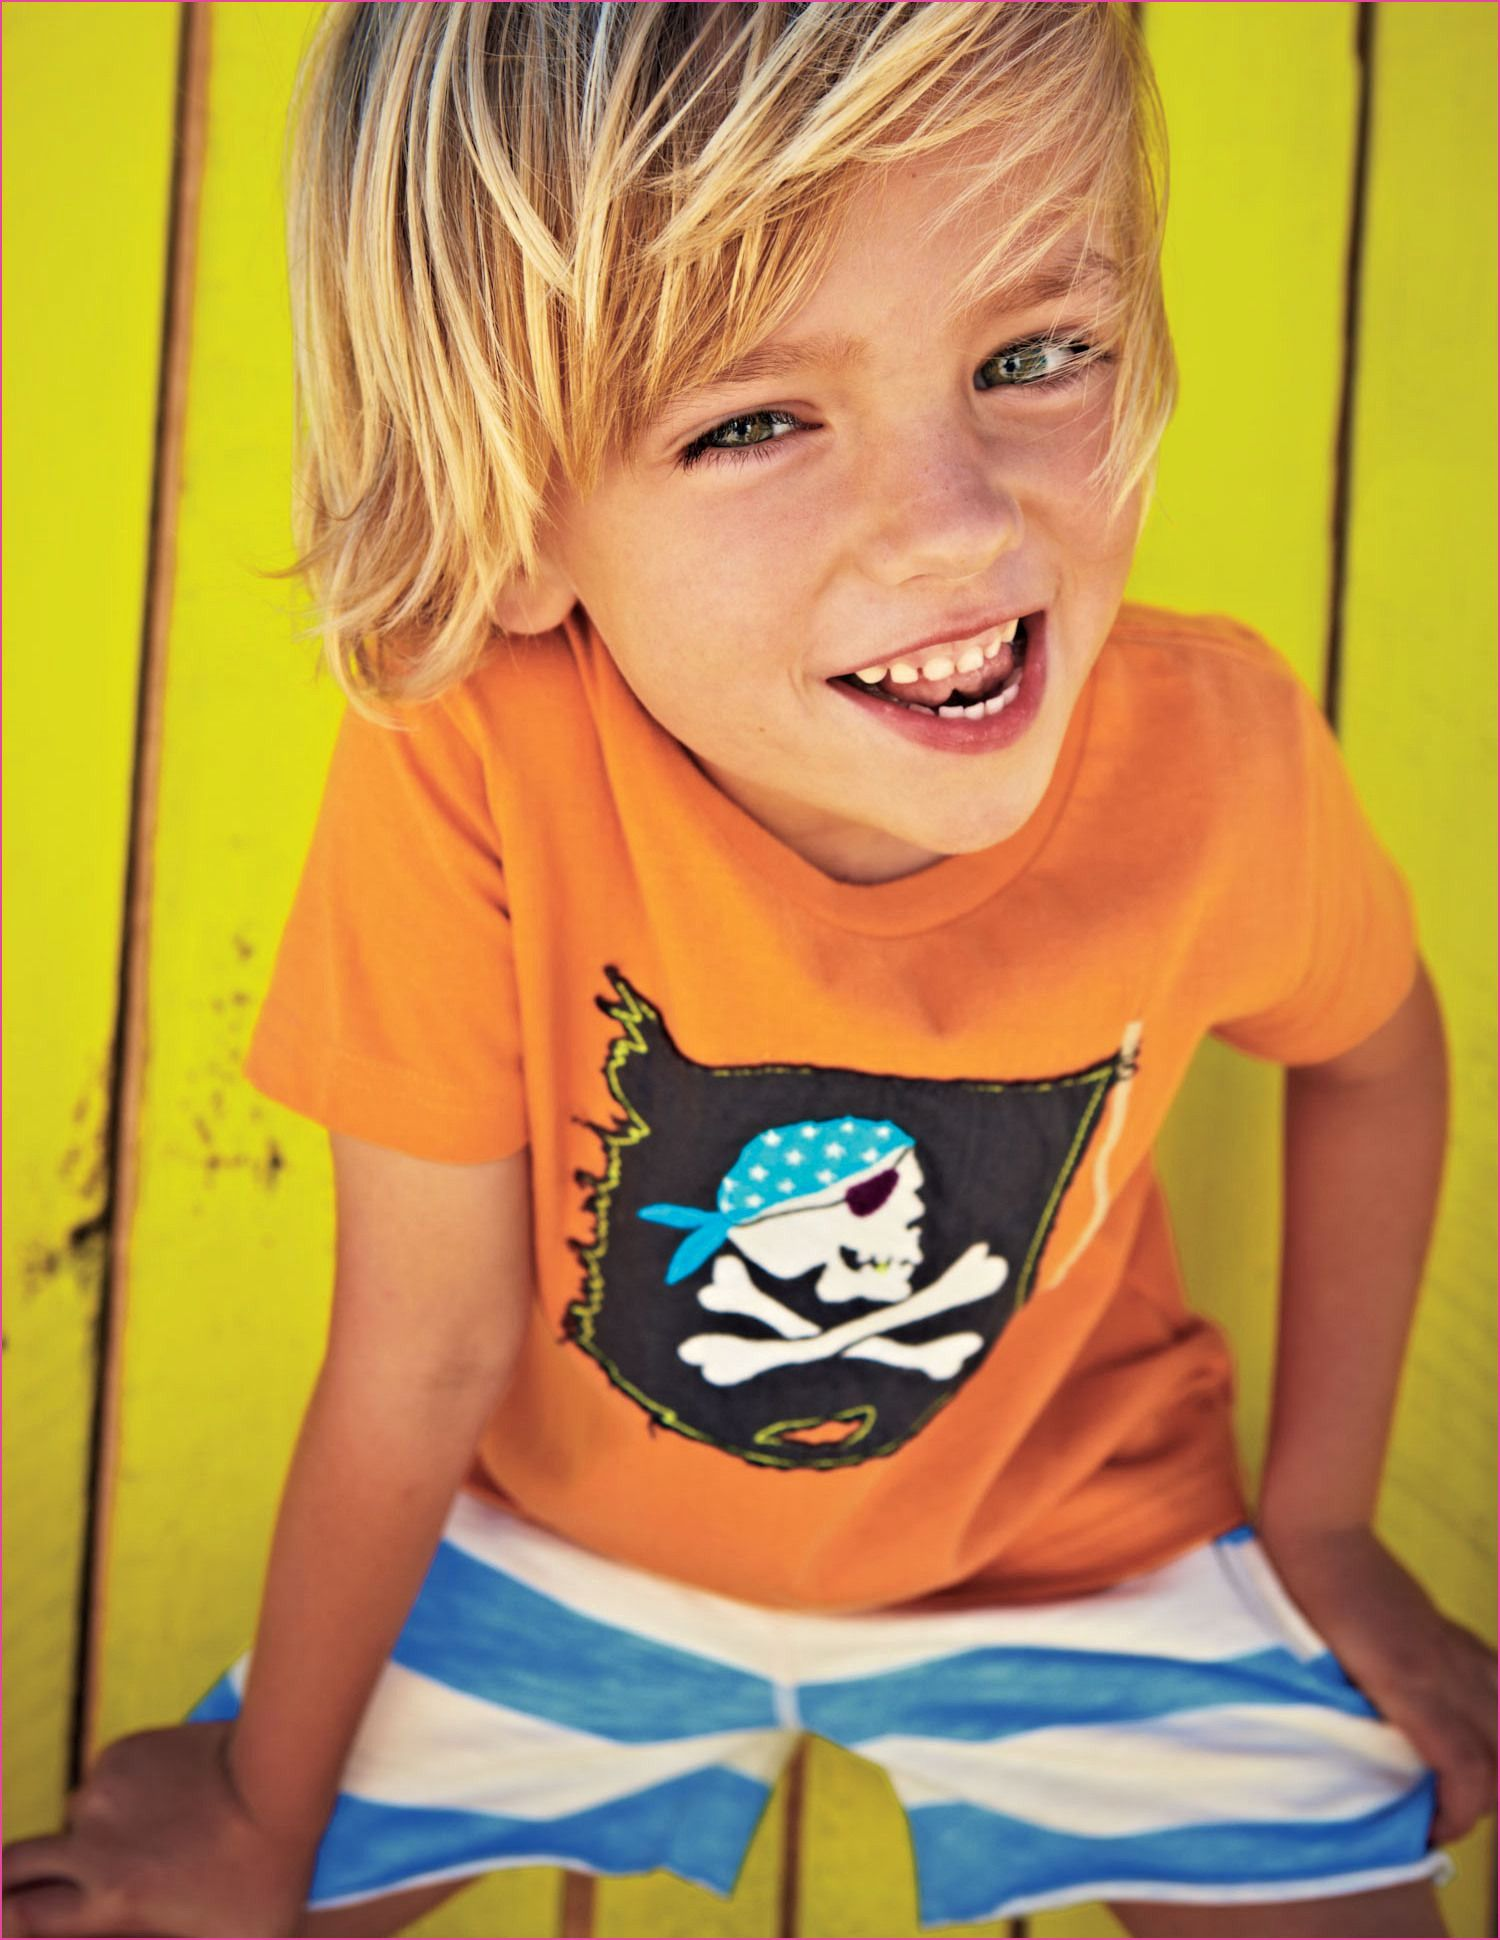 Coole Frisuren Mittellange Haare Jungs  Toddler boy haircuts, Boy